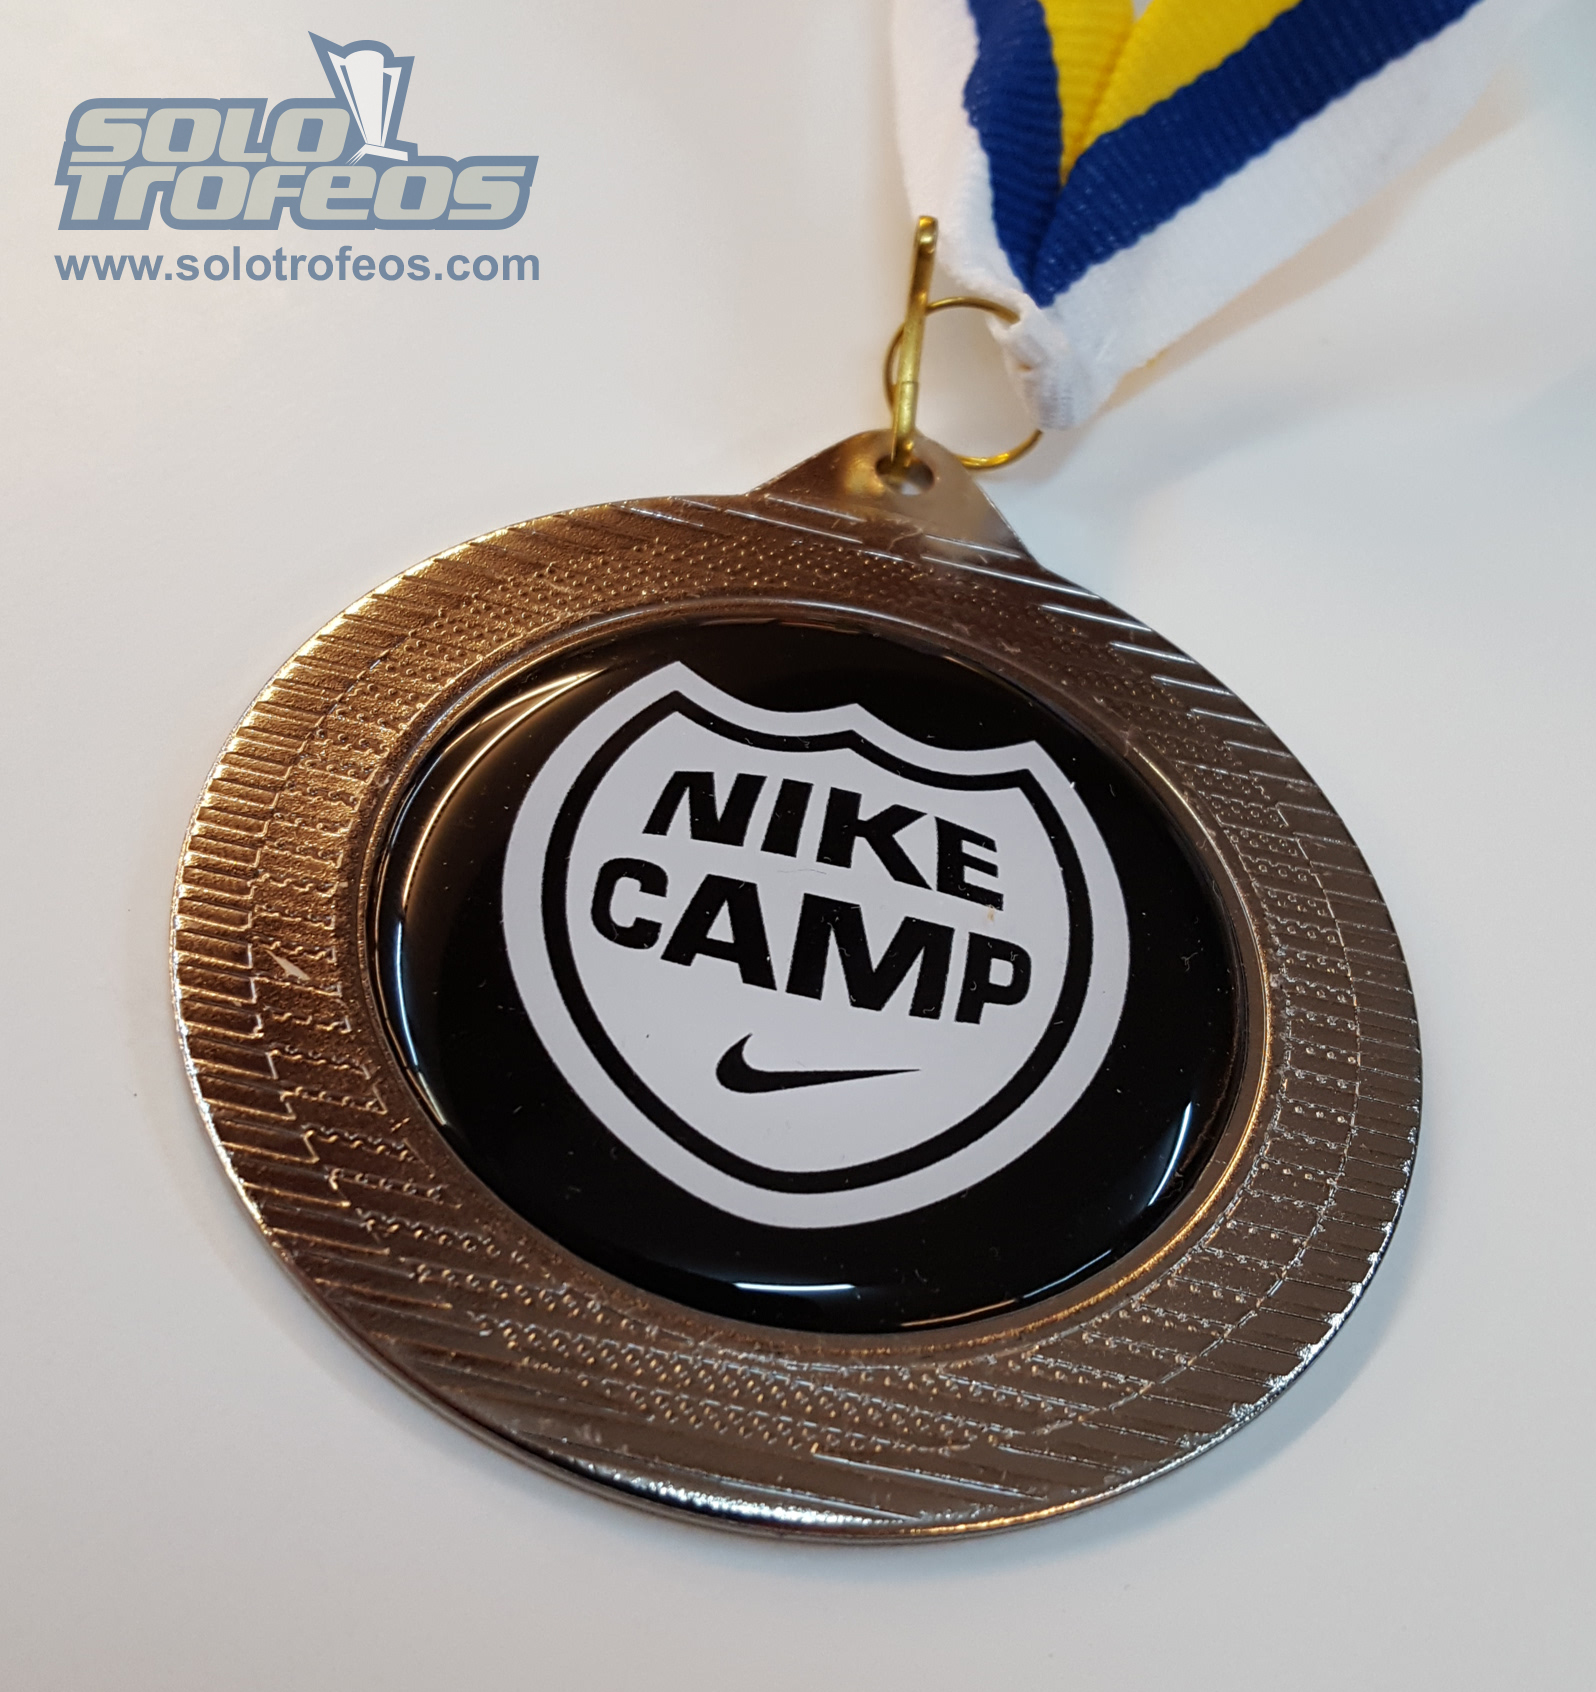 MEDALLA_NIKE CAMP